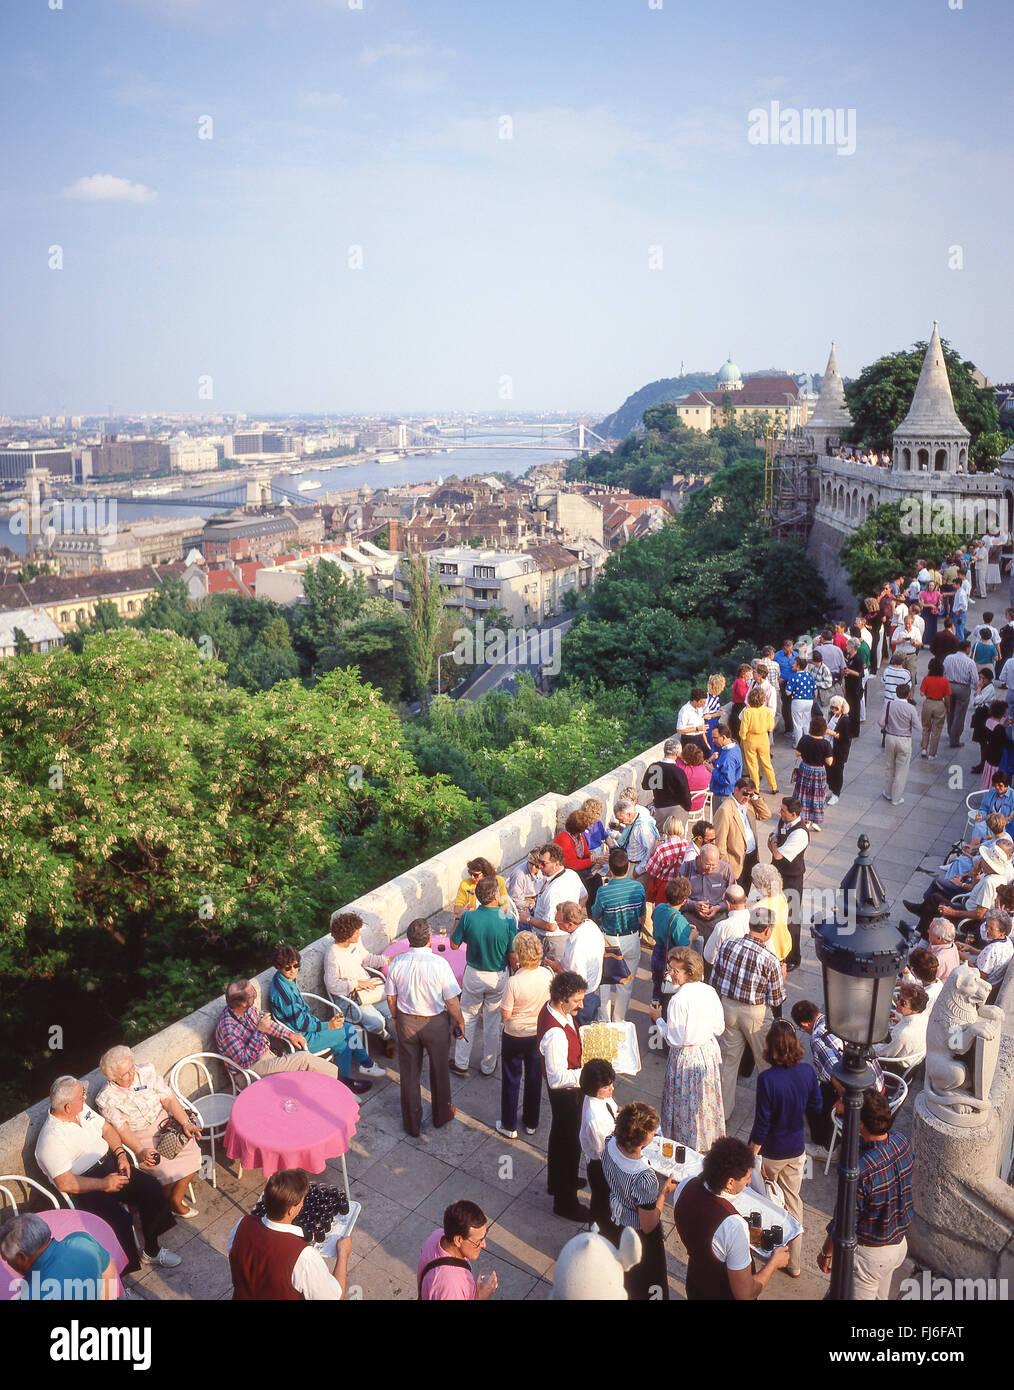 Drinks on terrace of Fisherman's Bastion,(Halászbástya), The Castle District, Buda District, Budapest, Republic Stock Photo